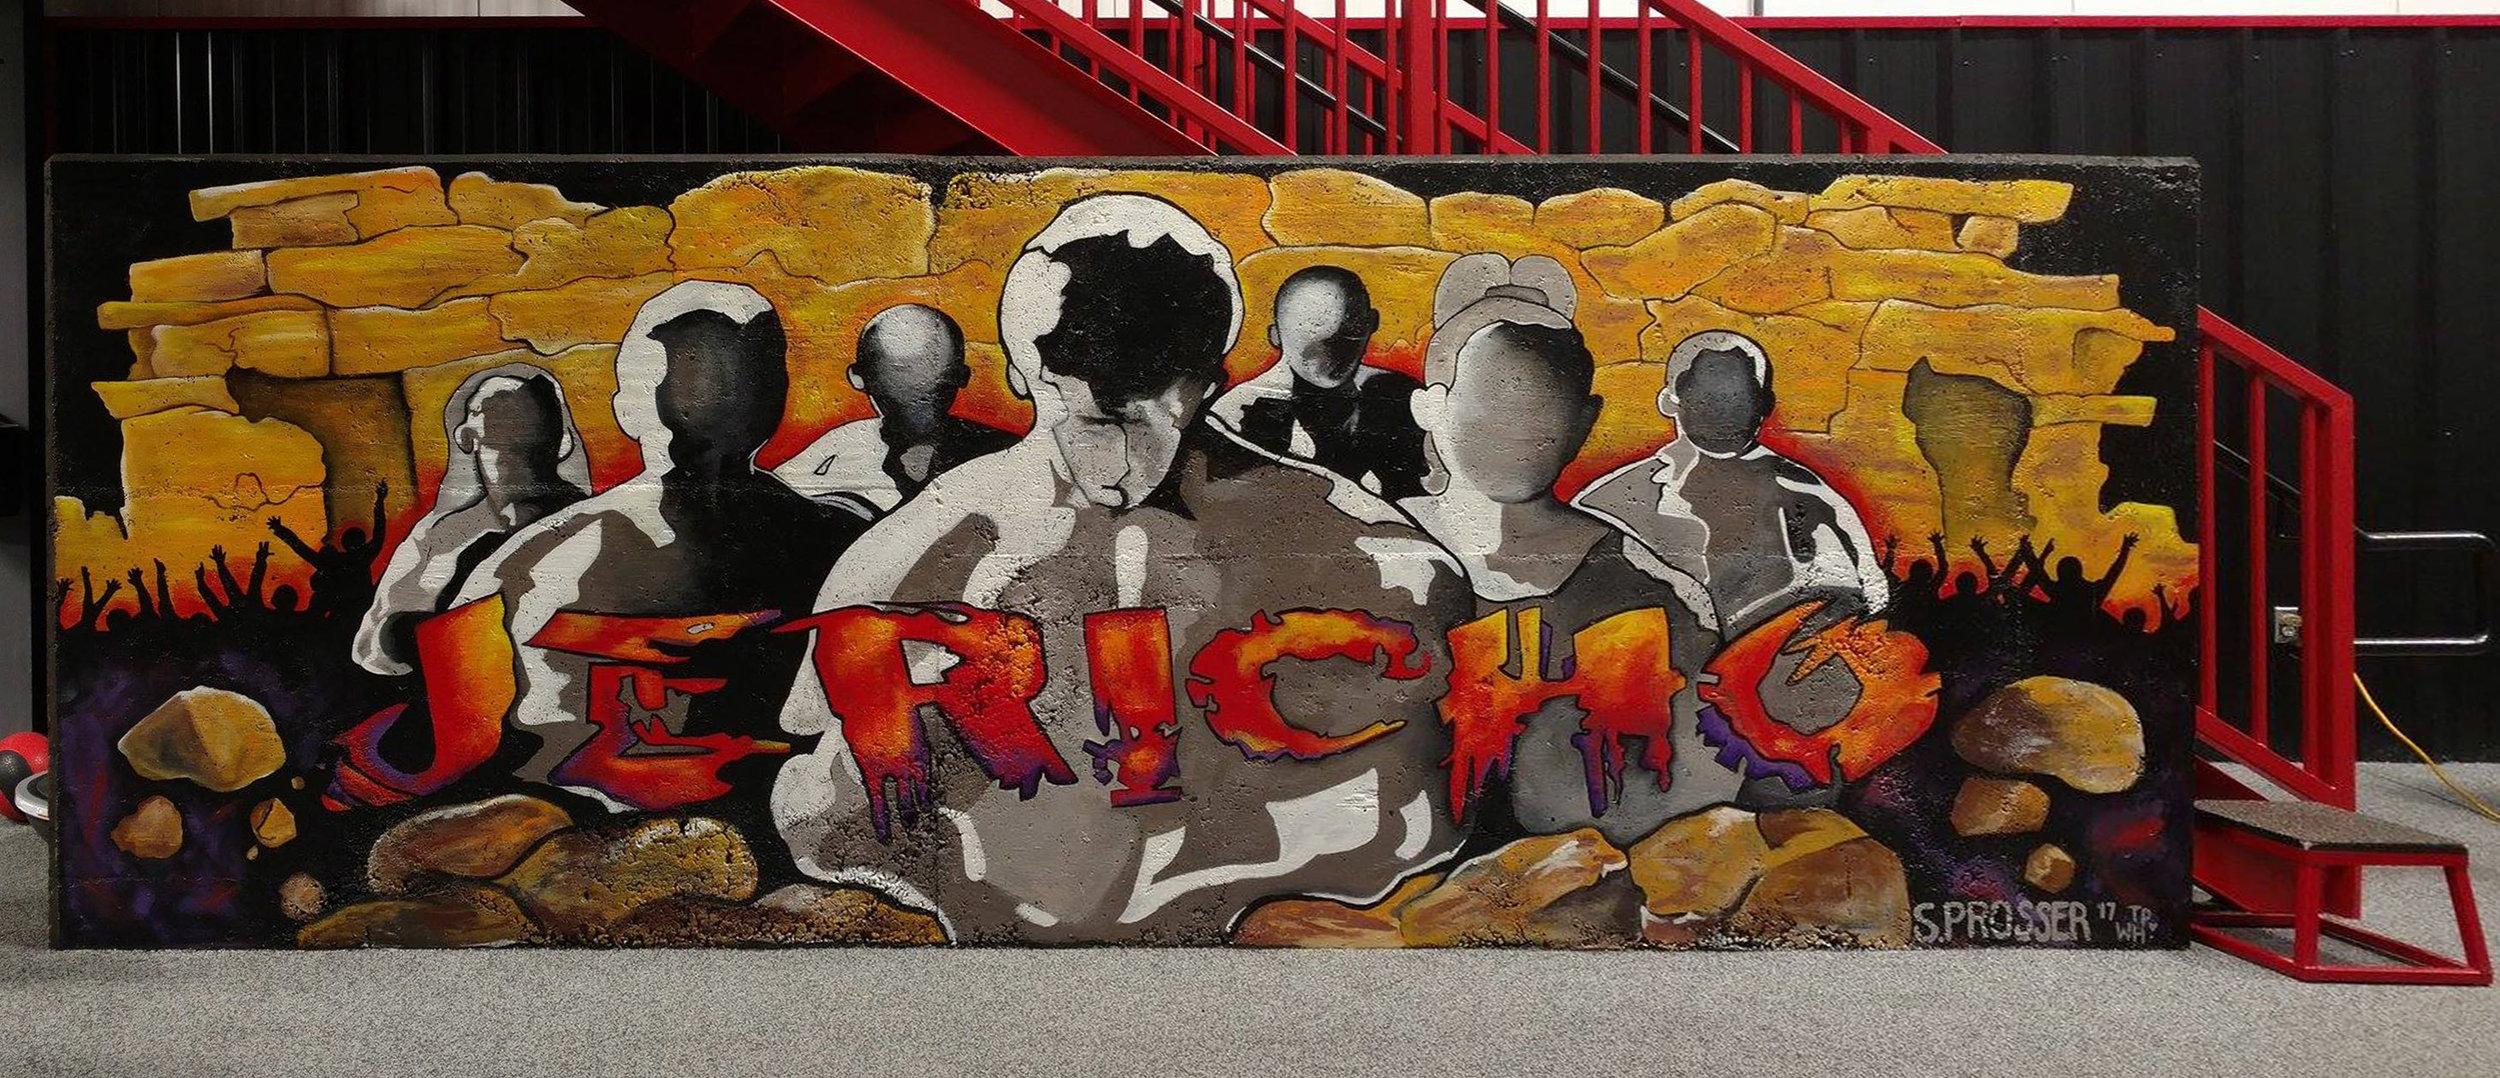 Jericho,  Mural - Acrylic Latex Enamel on Concrete,6 x 15 ft.